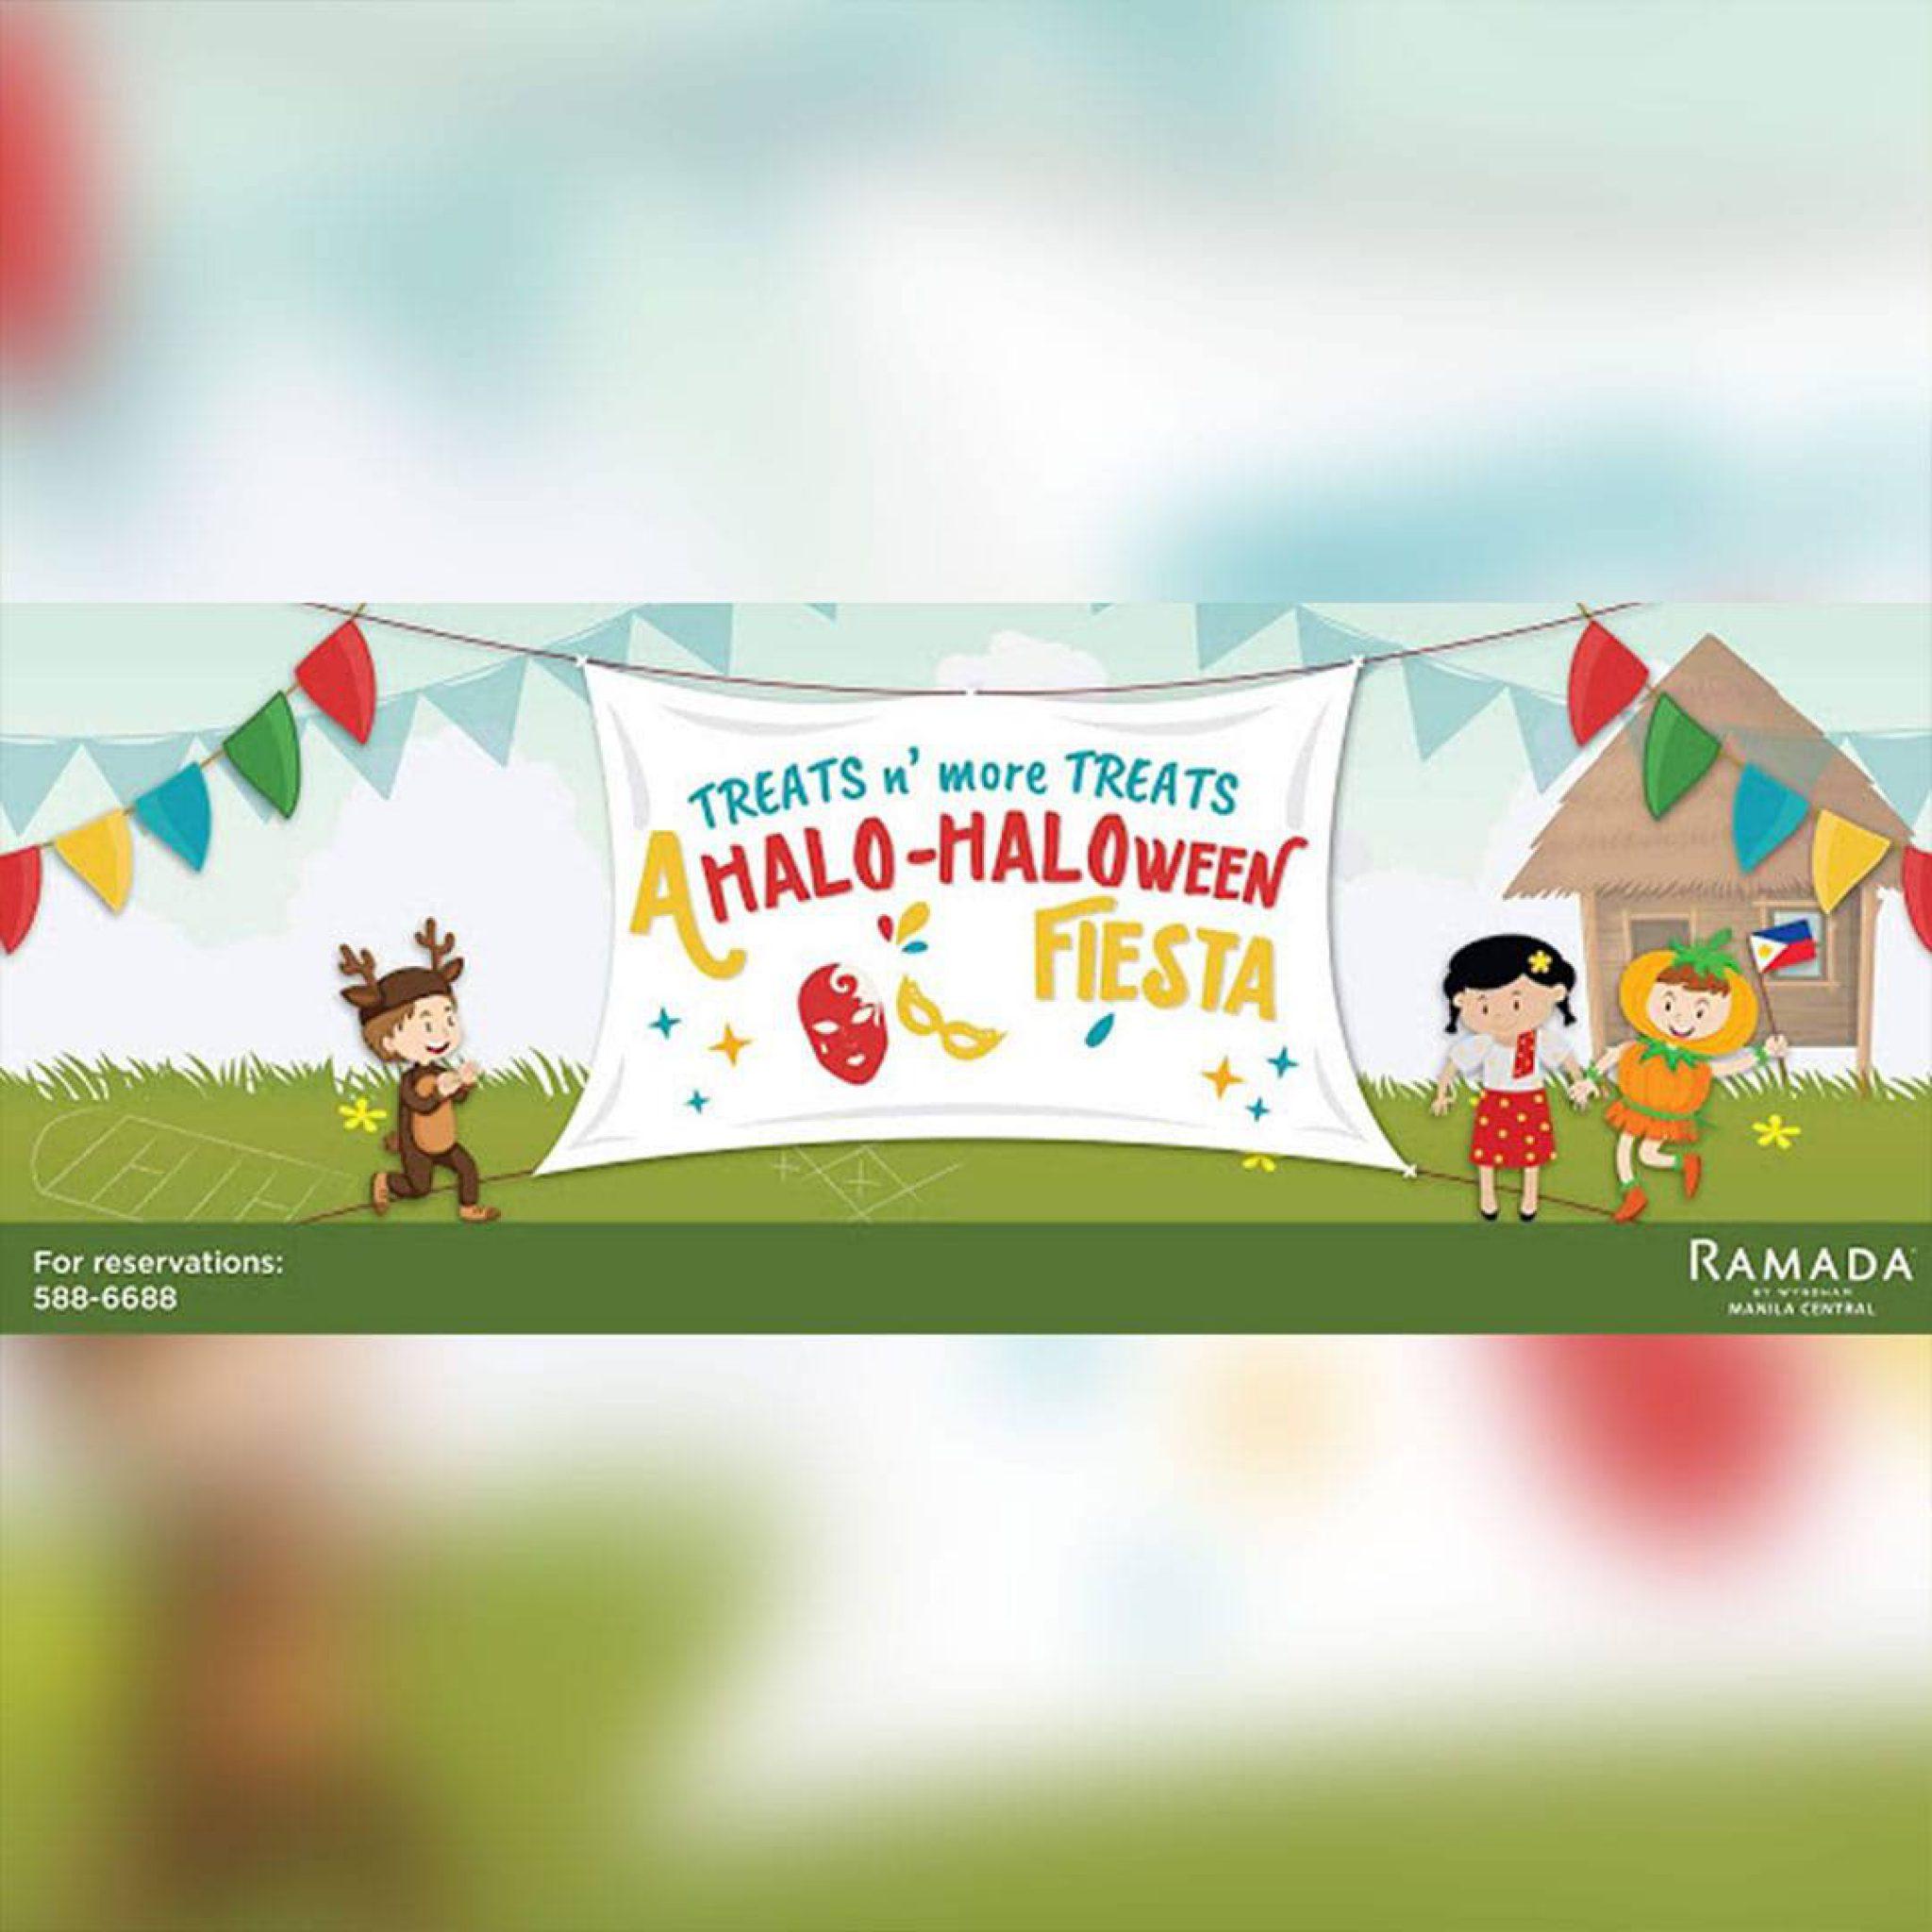 Ramada Manila: HALO-HALOween Fiesta